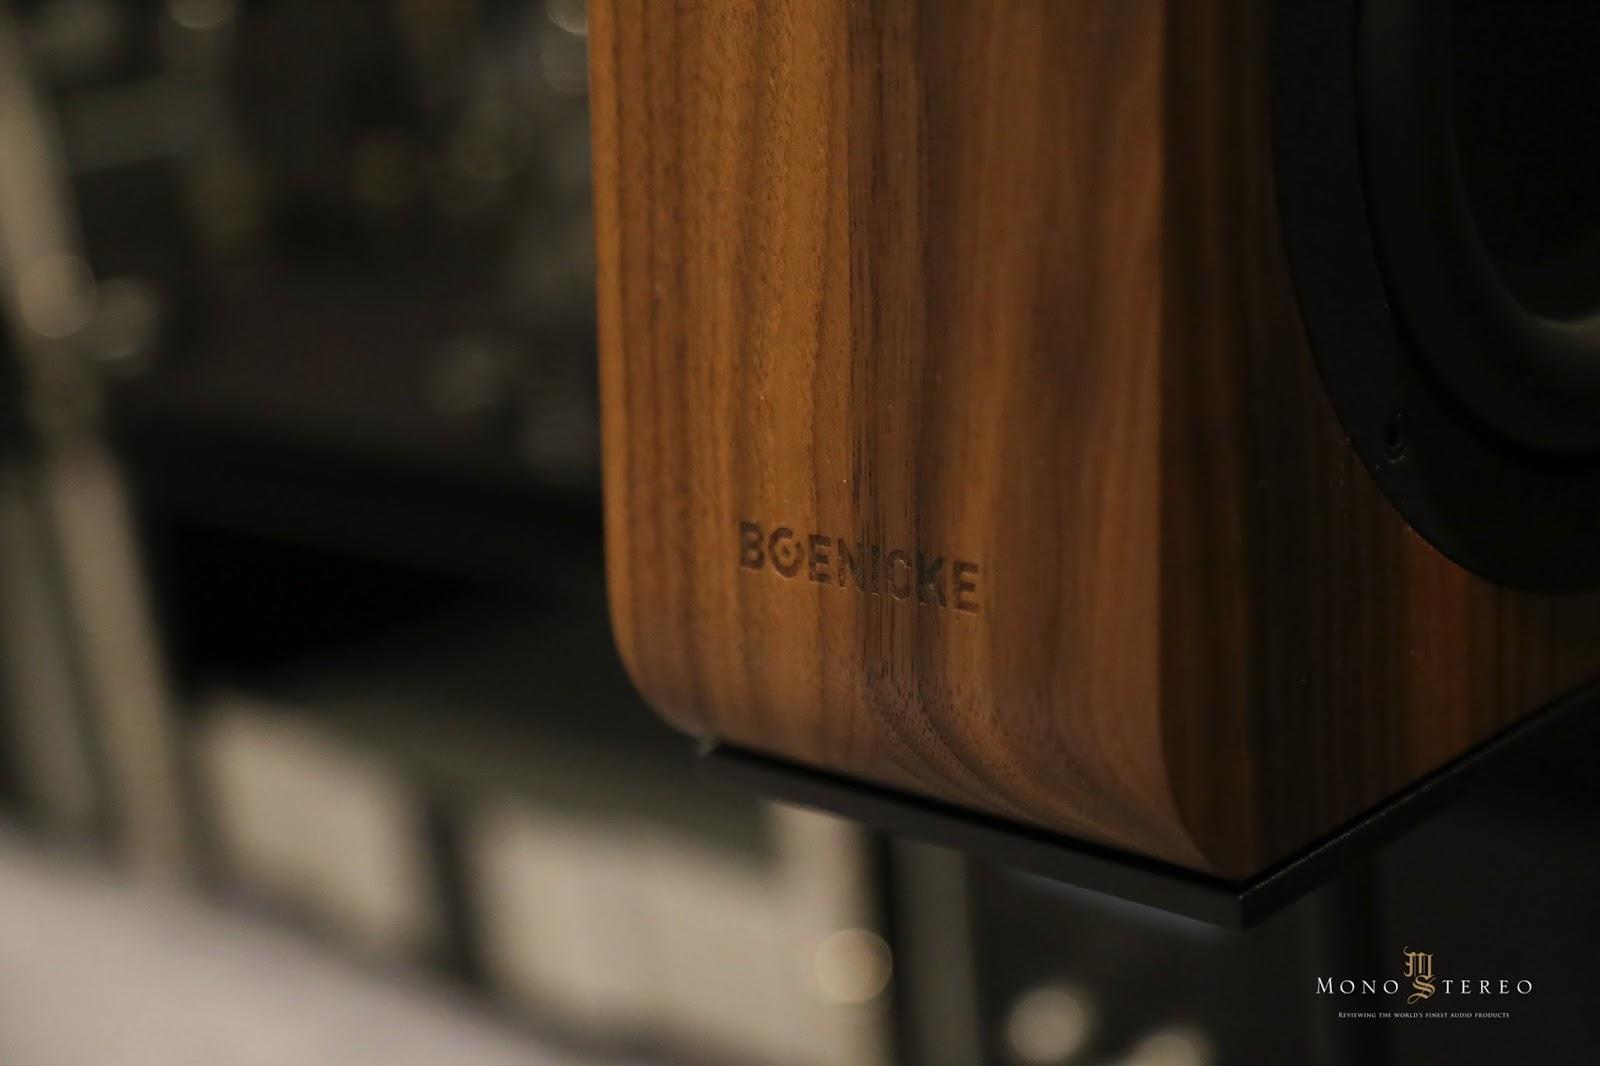 Mono and Stereo High-End Audio Magazine: Boenicke Audio W5